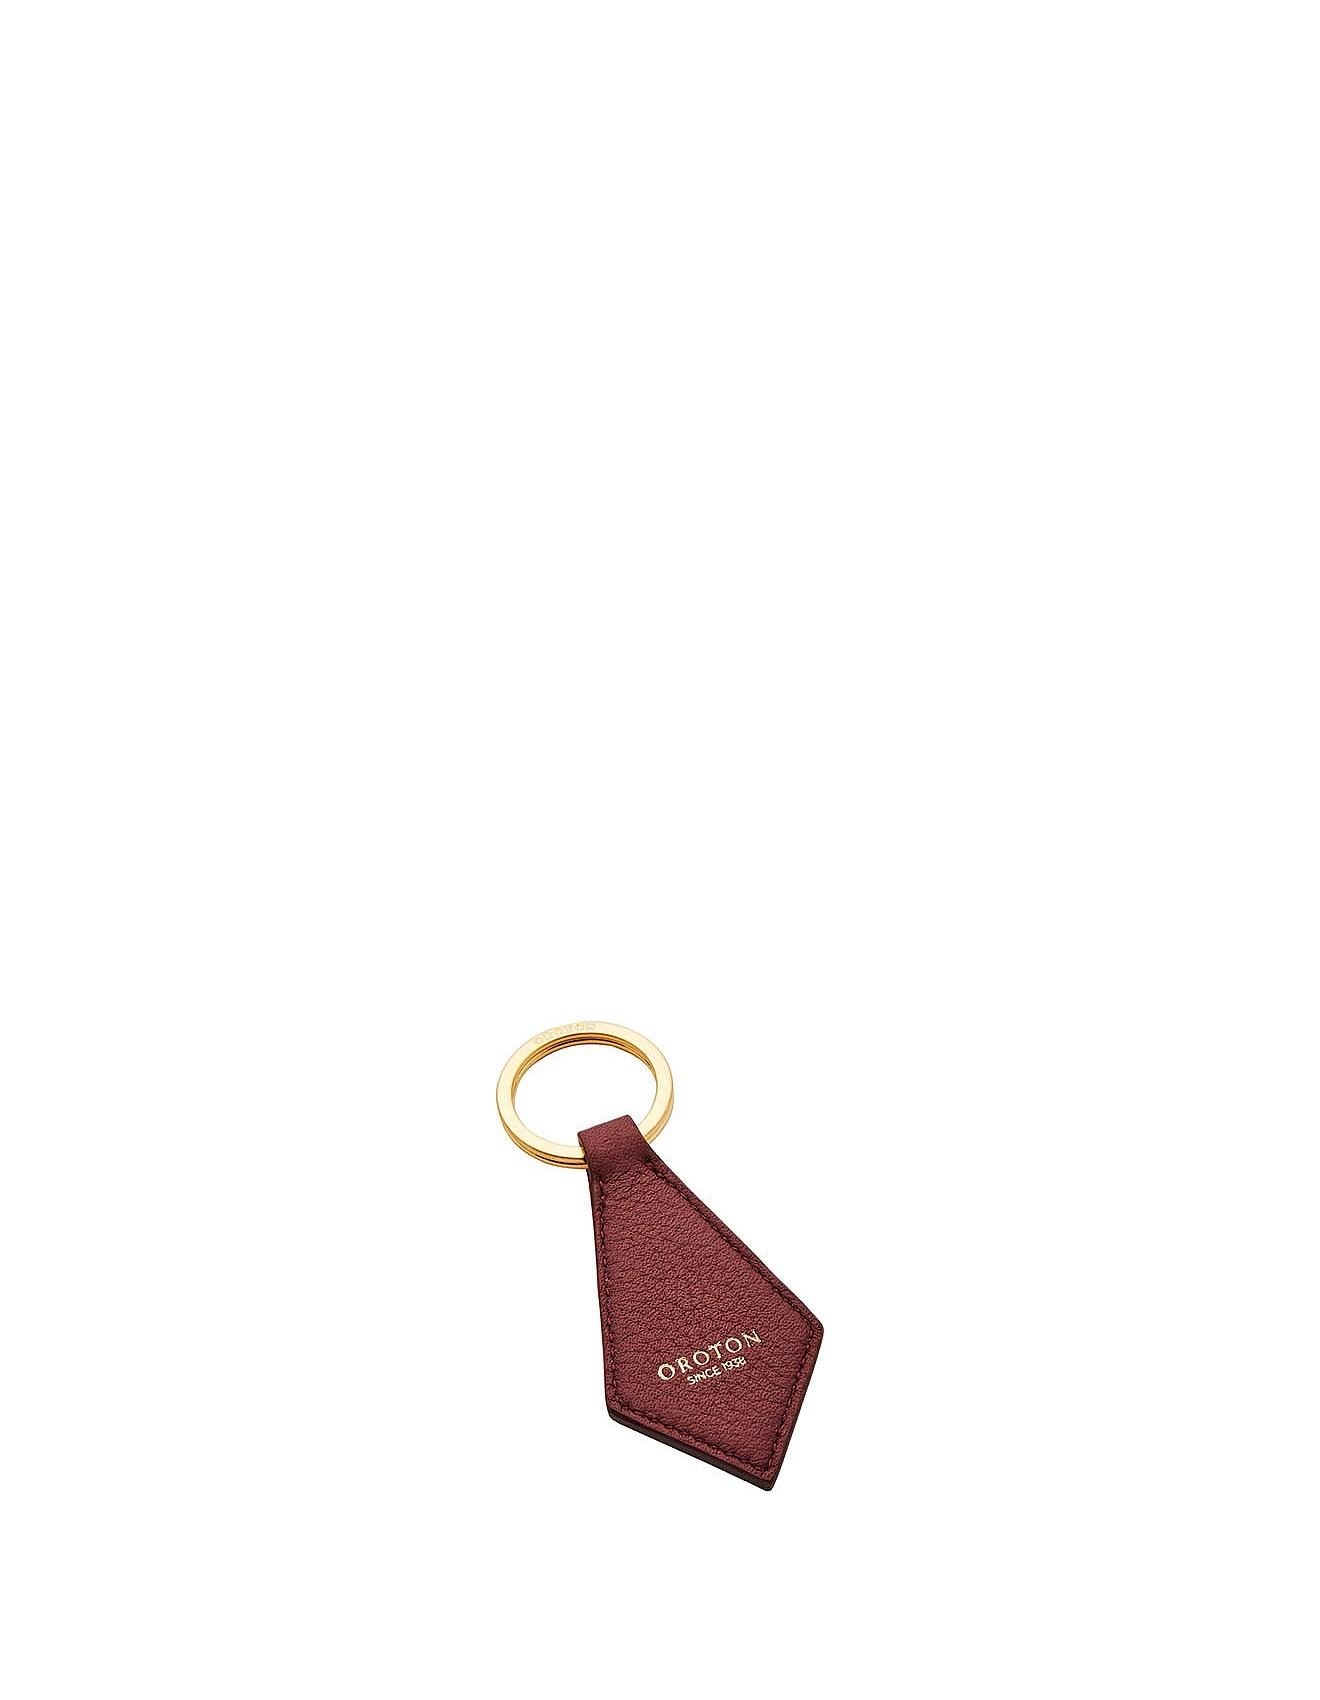 Promotion - Duo- Key Ring